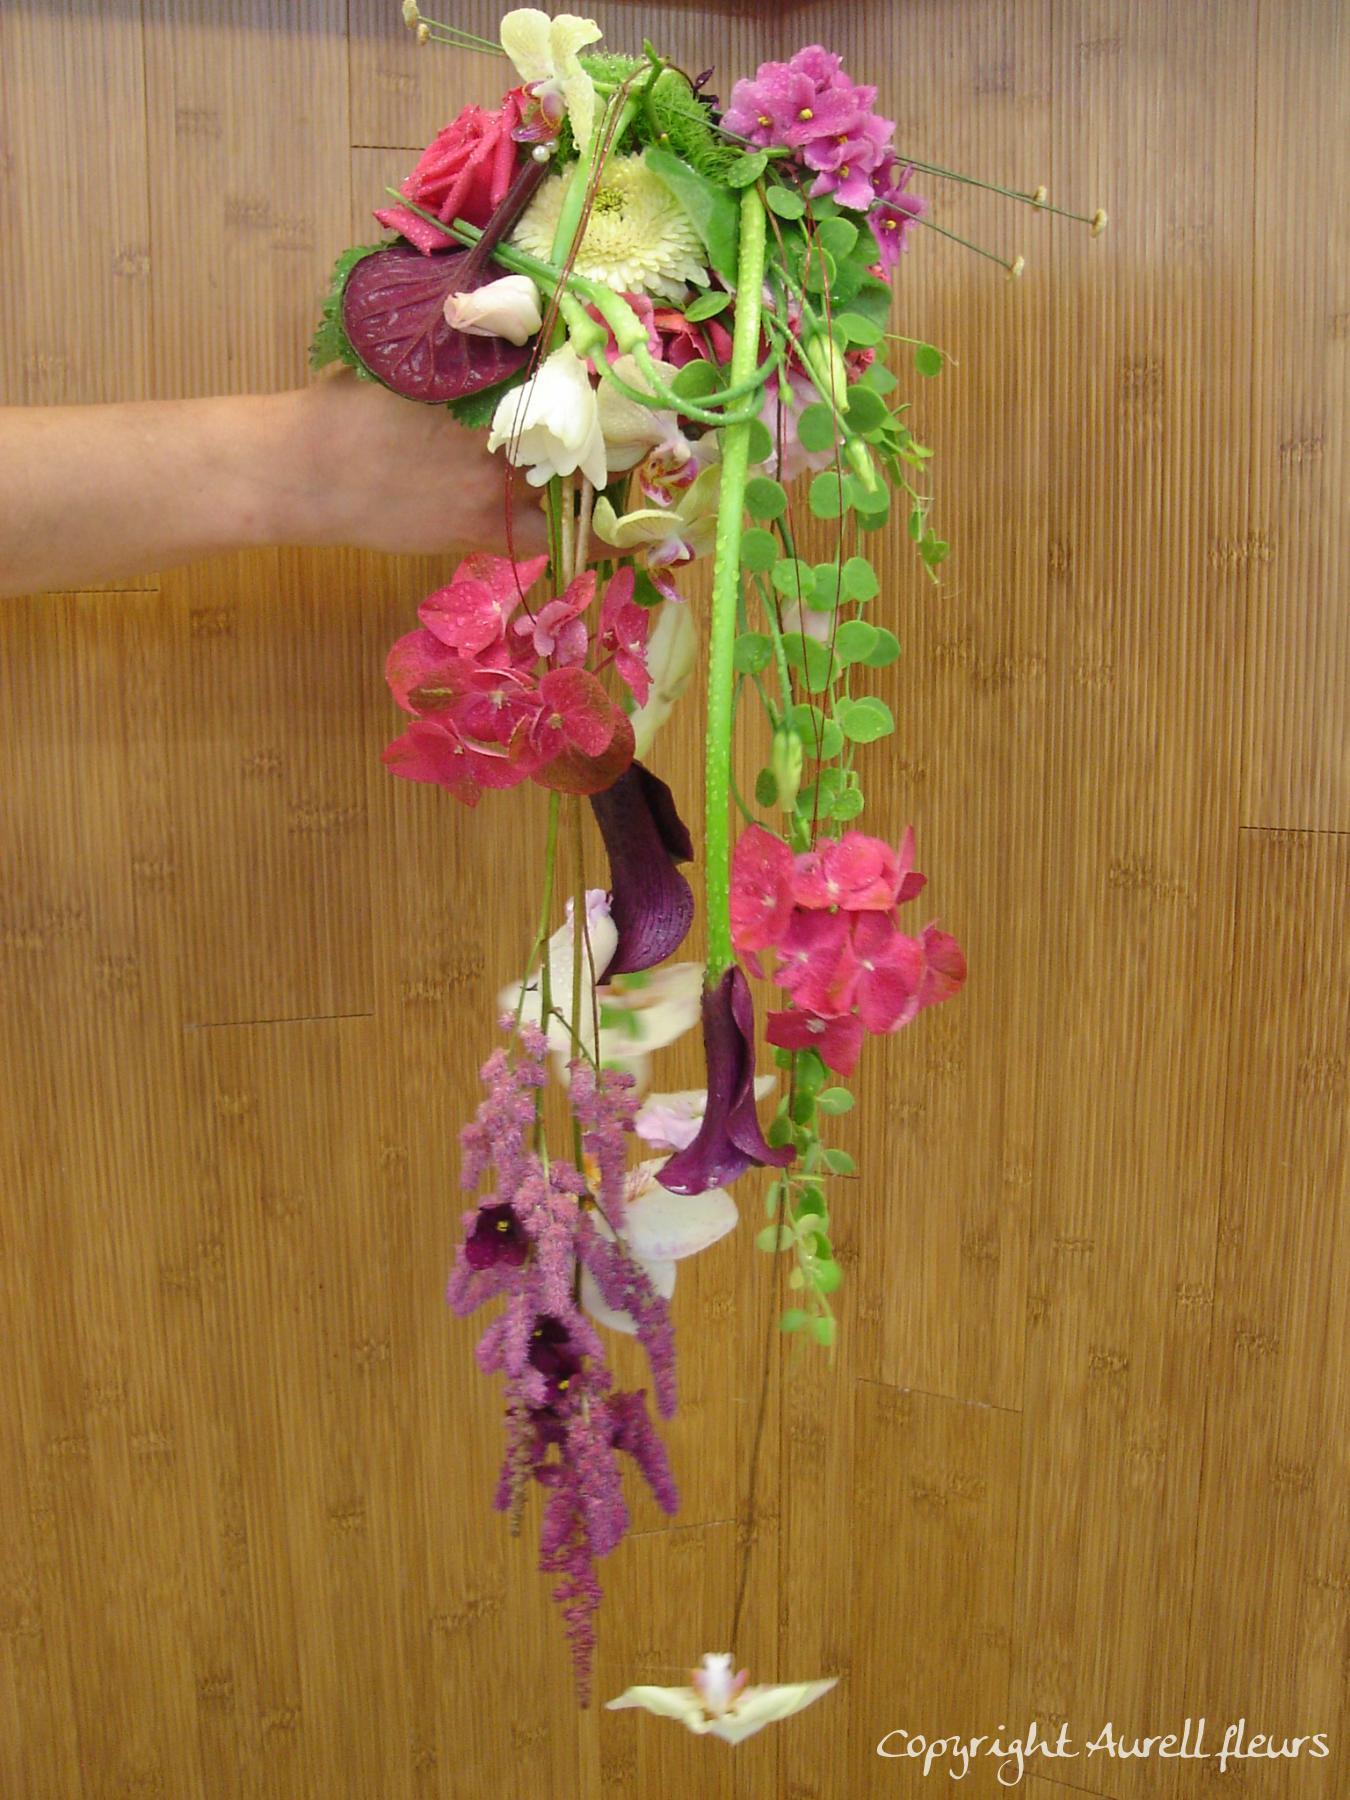 bouquet chute à Saint-Jean-de-Braye | Aurell fleurs